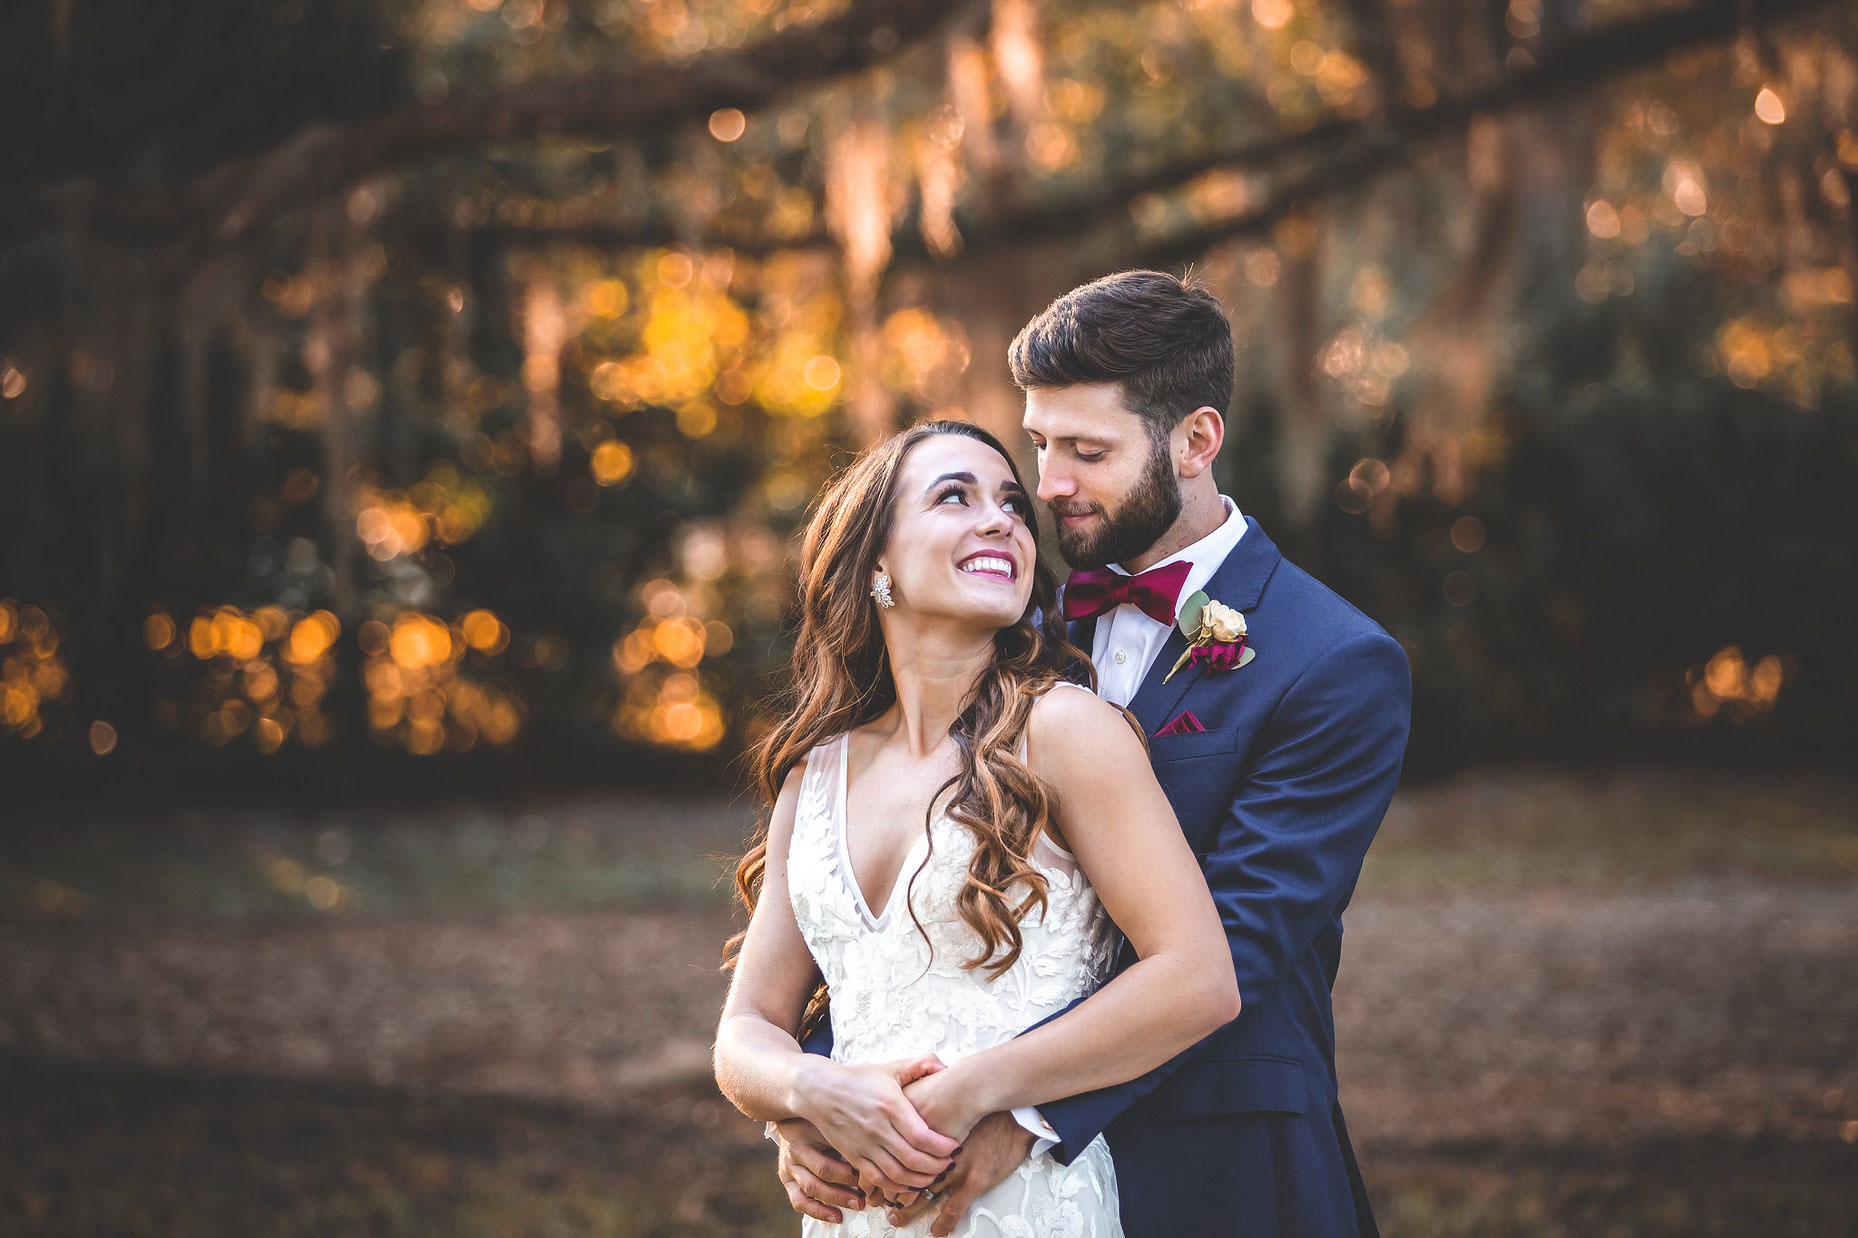 adam-szarmack-bowing-oaks-wedding-photographer-jacksonville-100.jpg